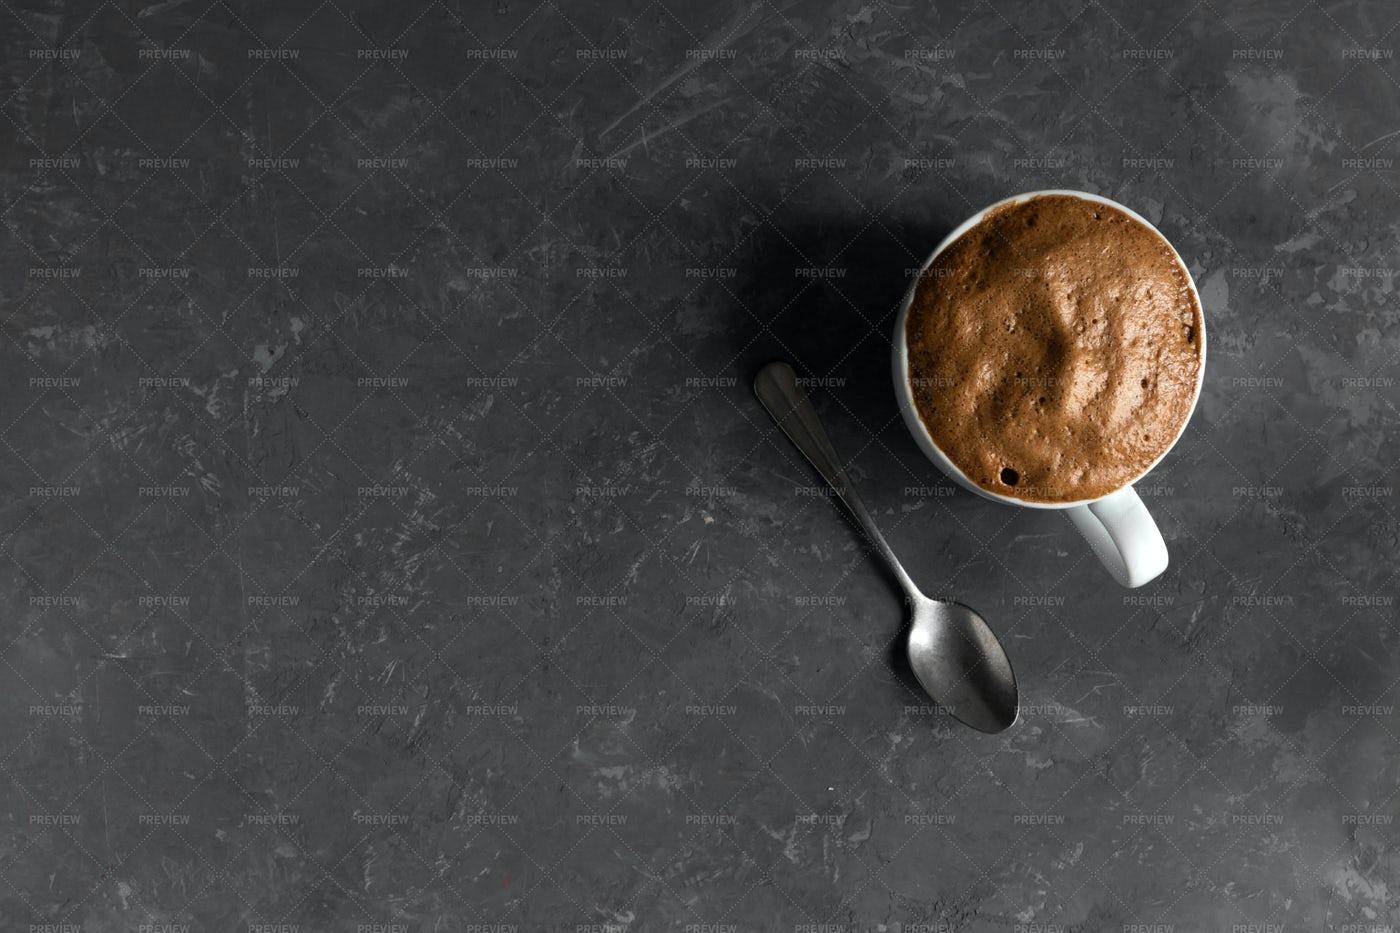 Creamy Dalgona Coffee: Stock Photos